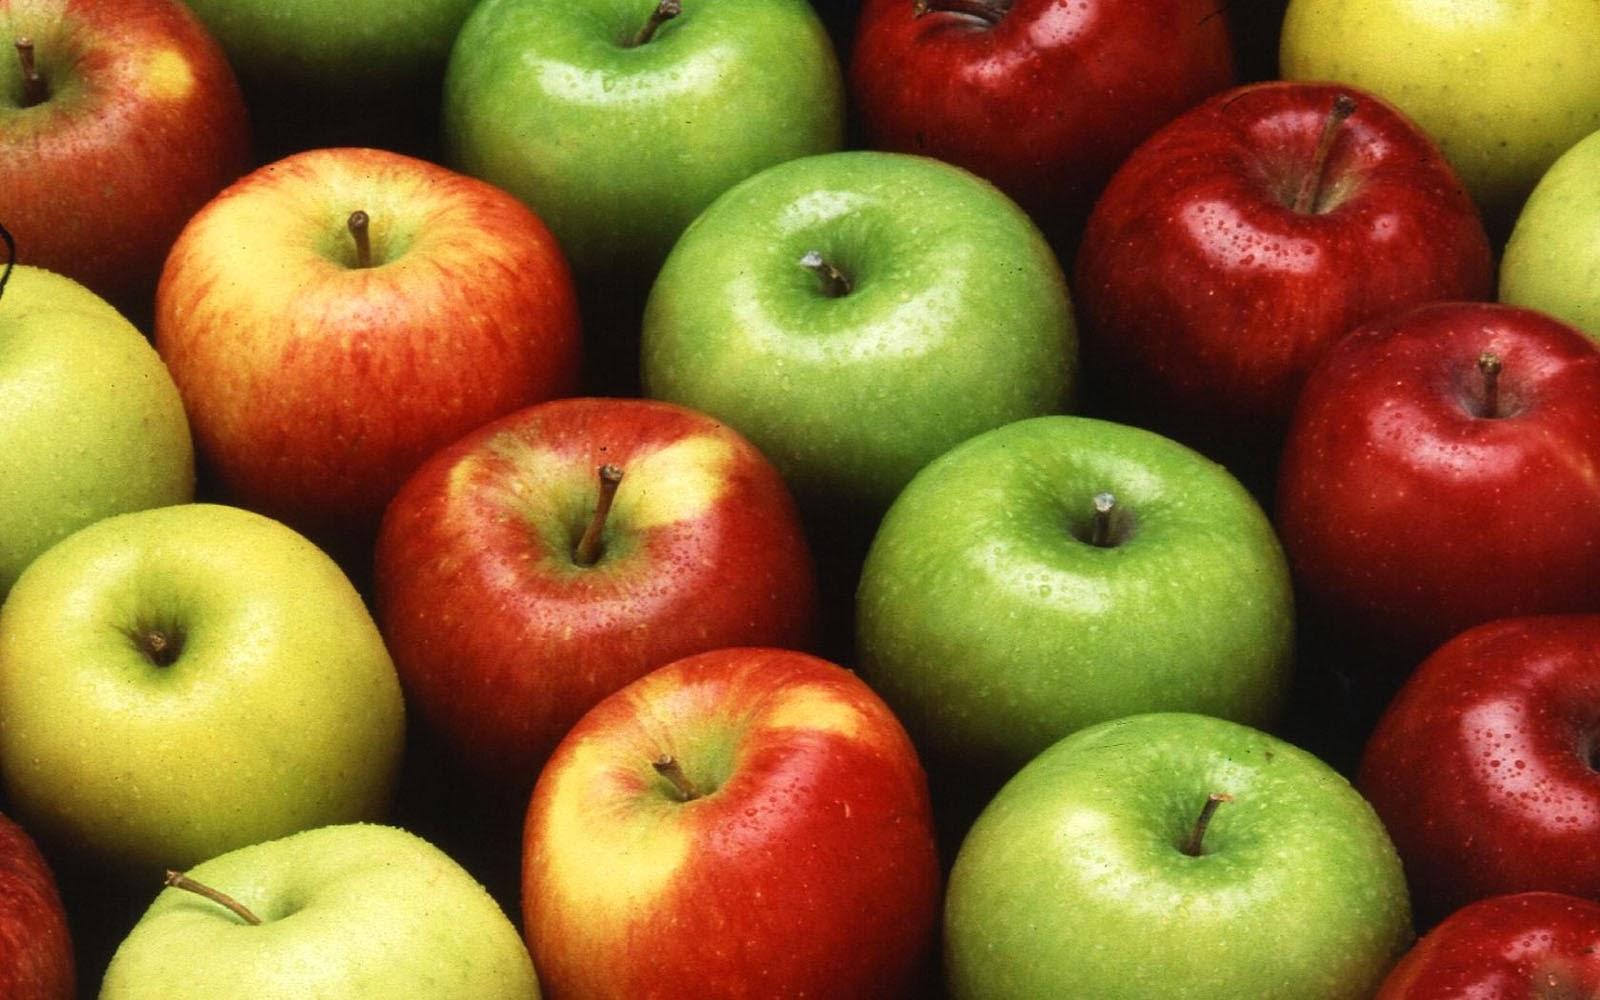 clovisso wallpaper gallery: apples wallpapers